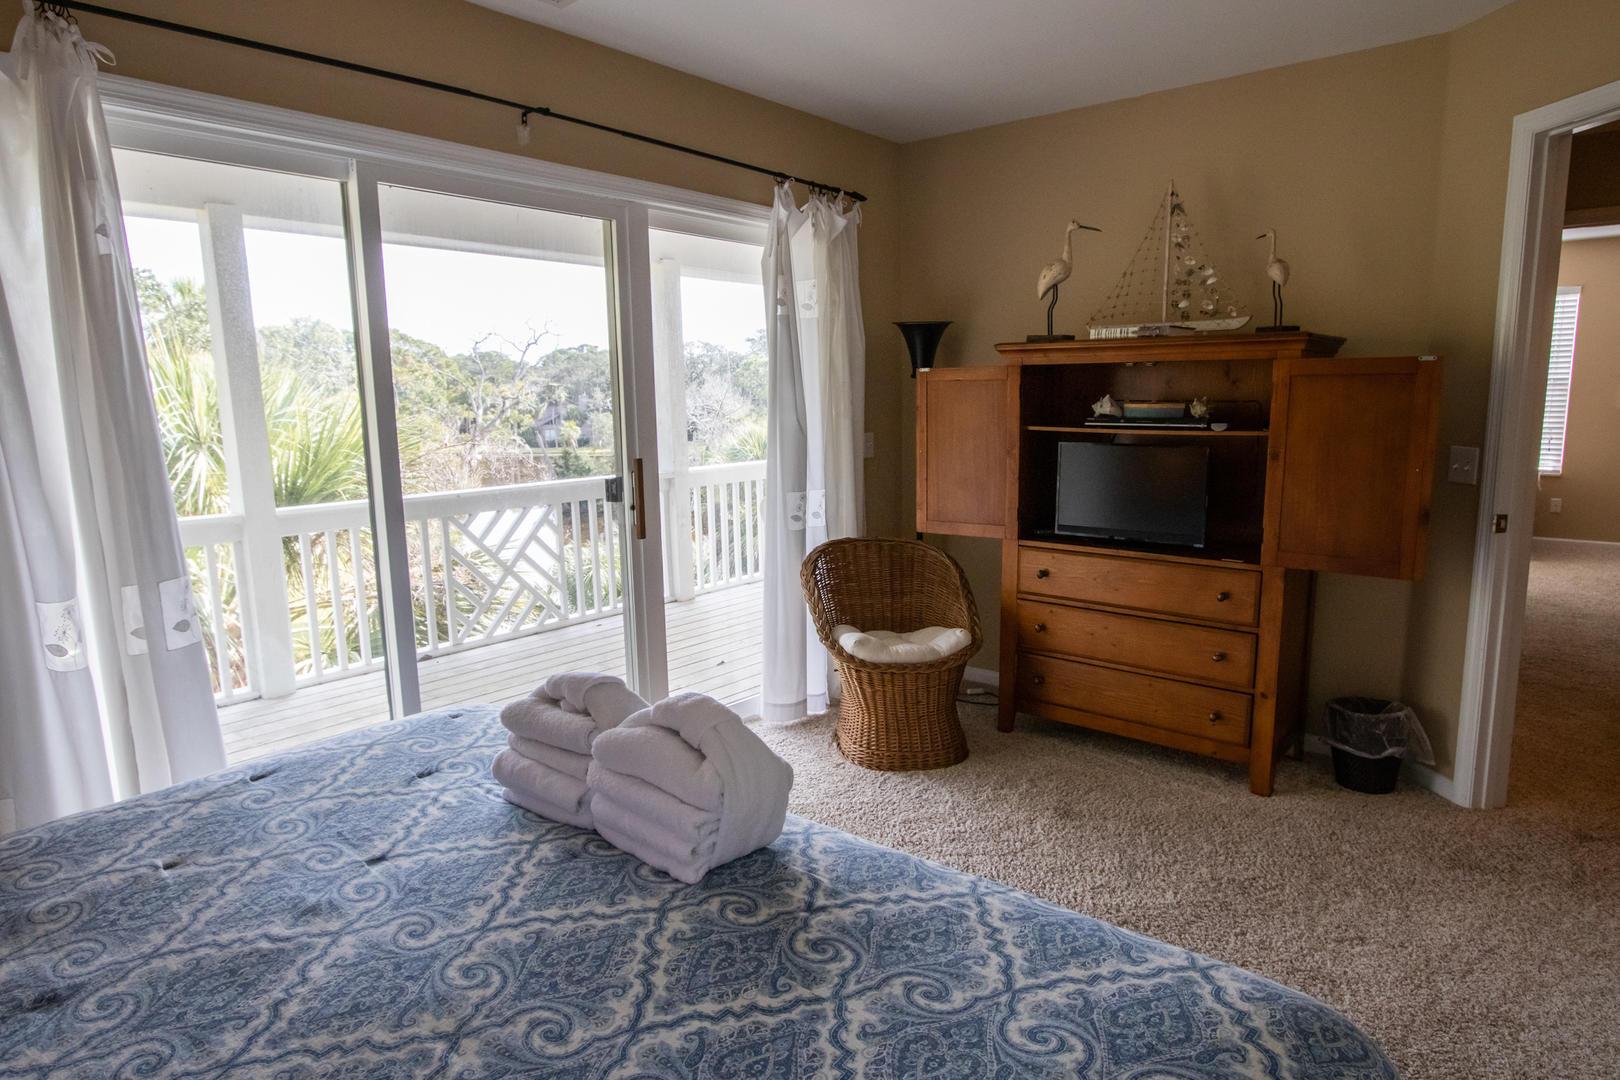 Bedroom 2, 2nd floor, TV w/ DVD player, access to balcony